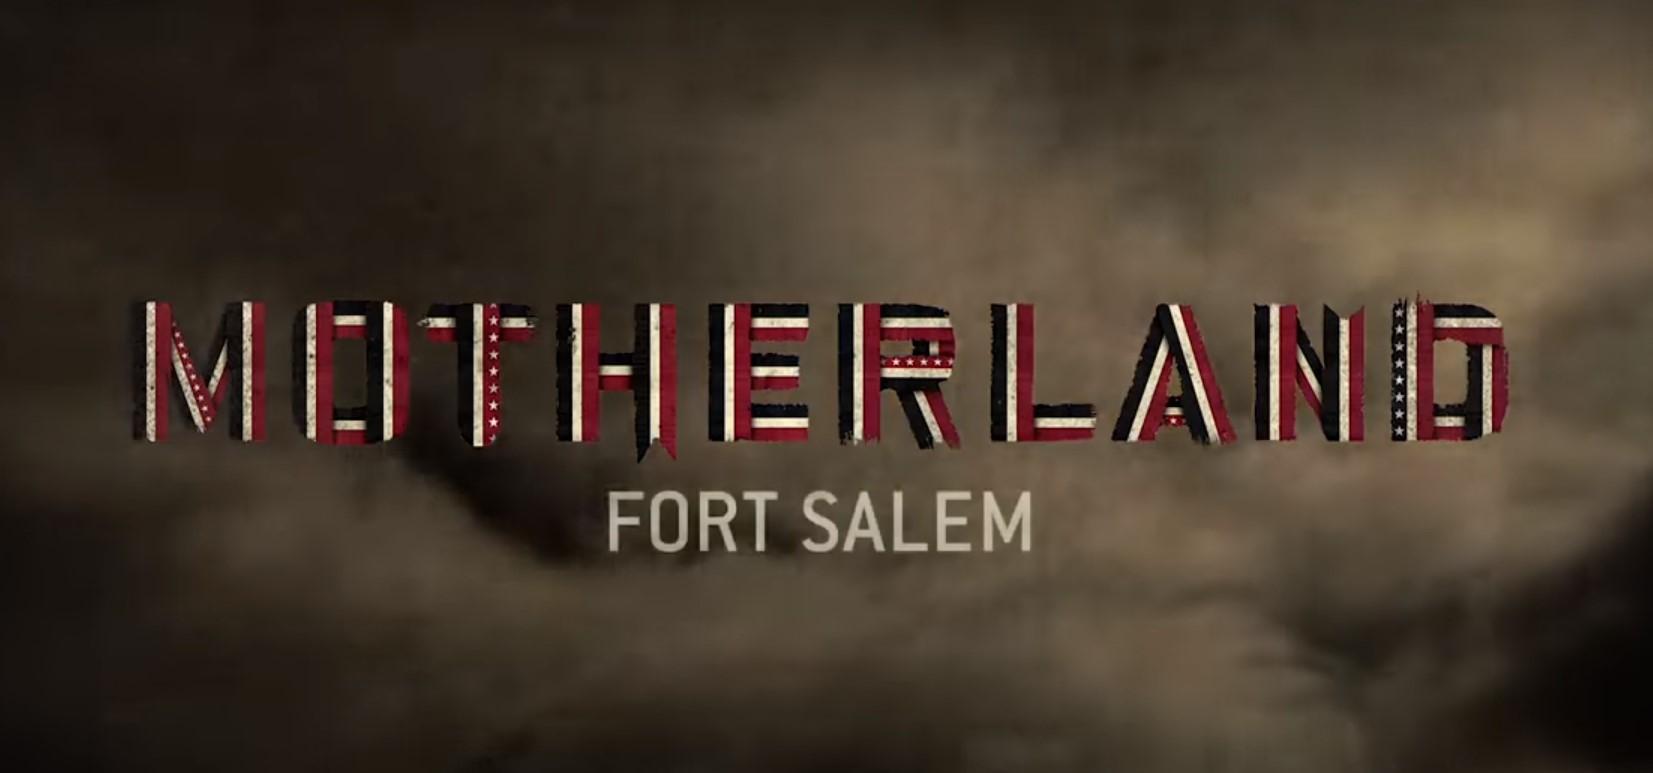 Motherland Fort Salem trama, cast, anticipazioni serie tv. Quando esce